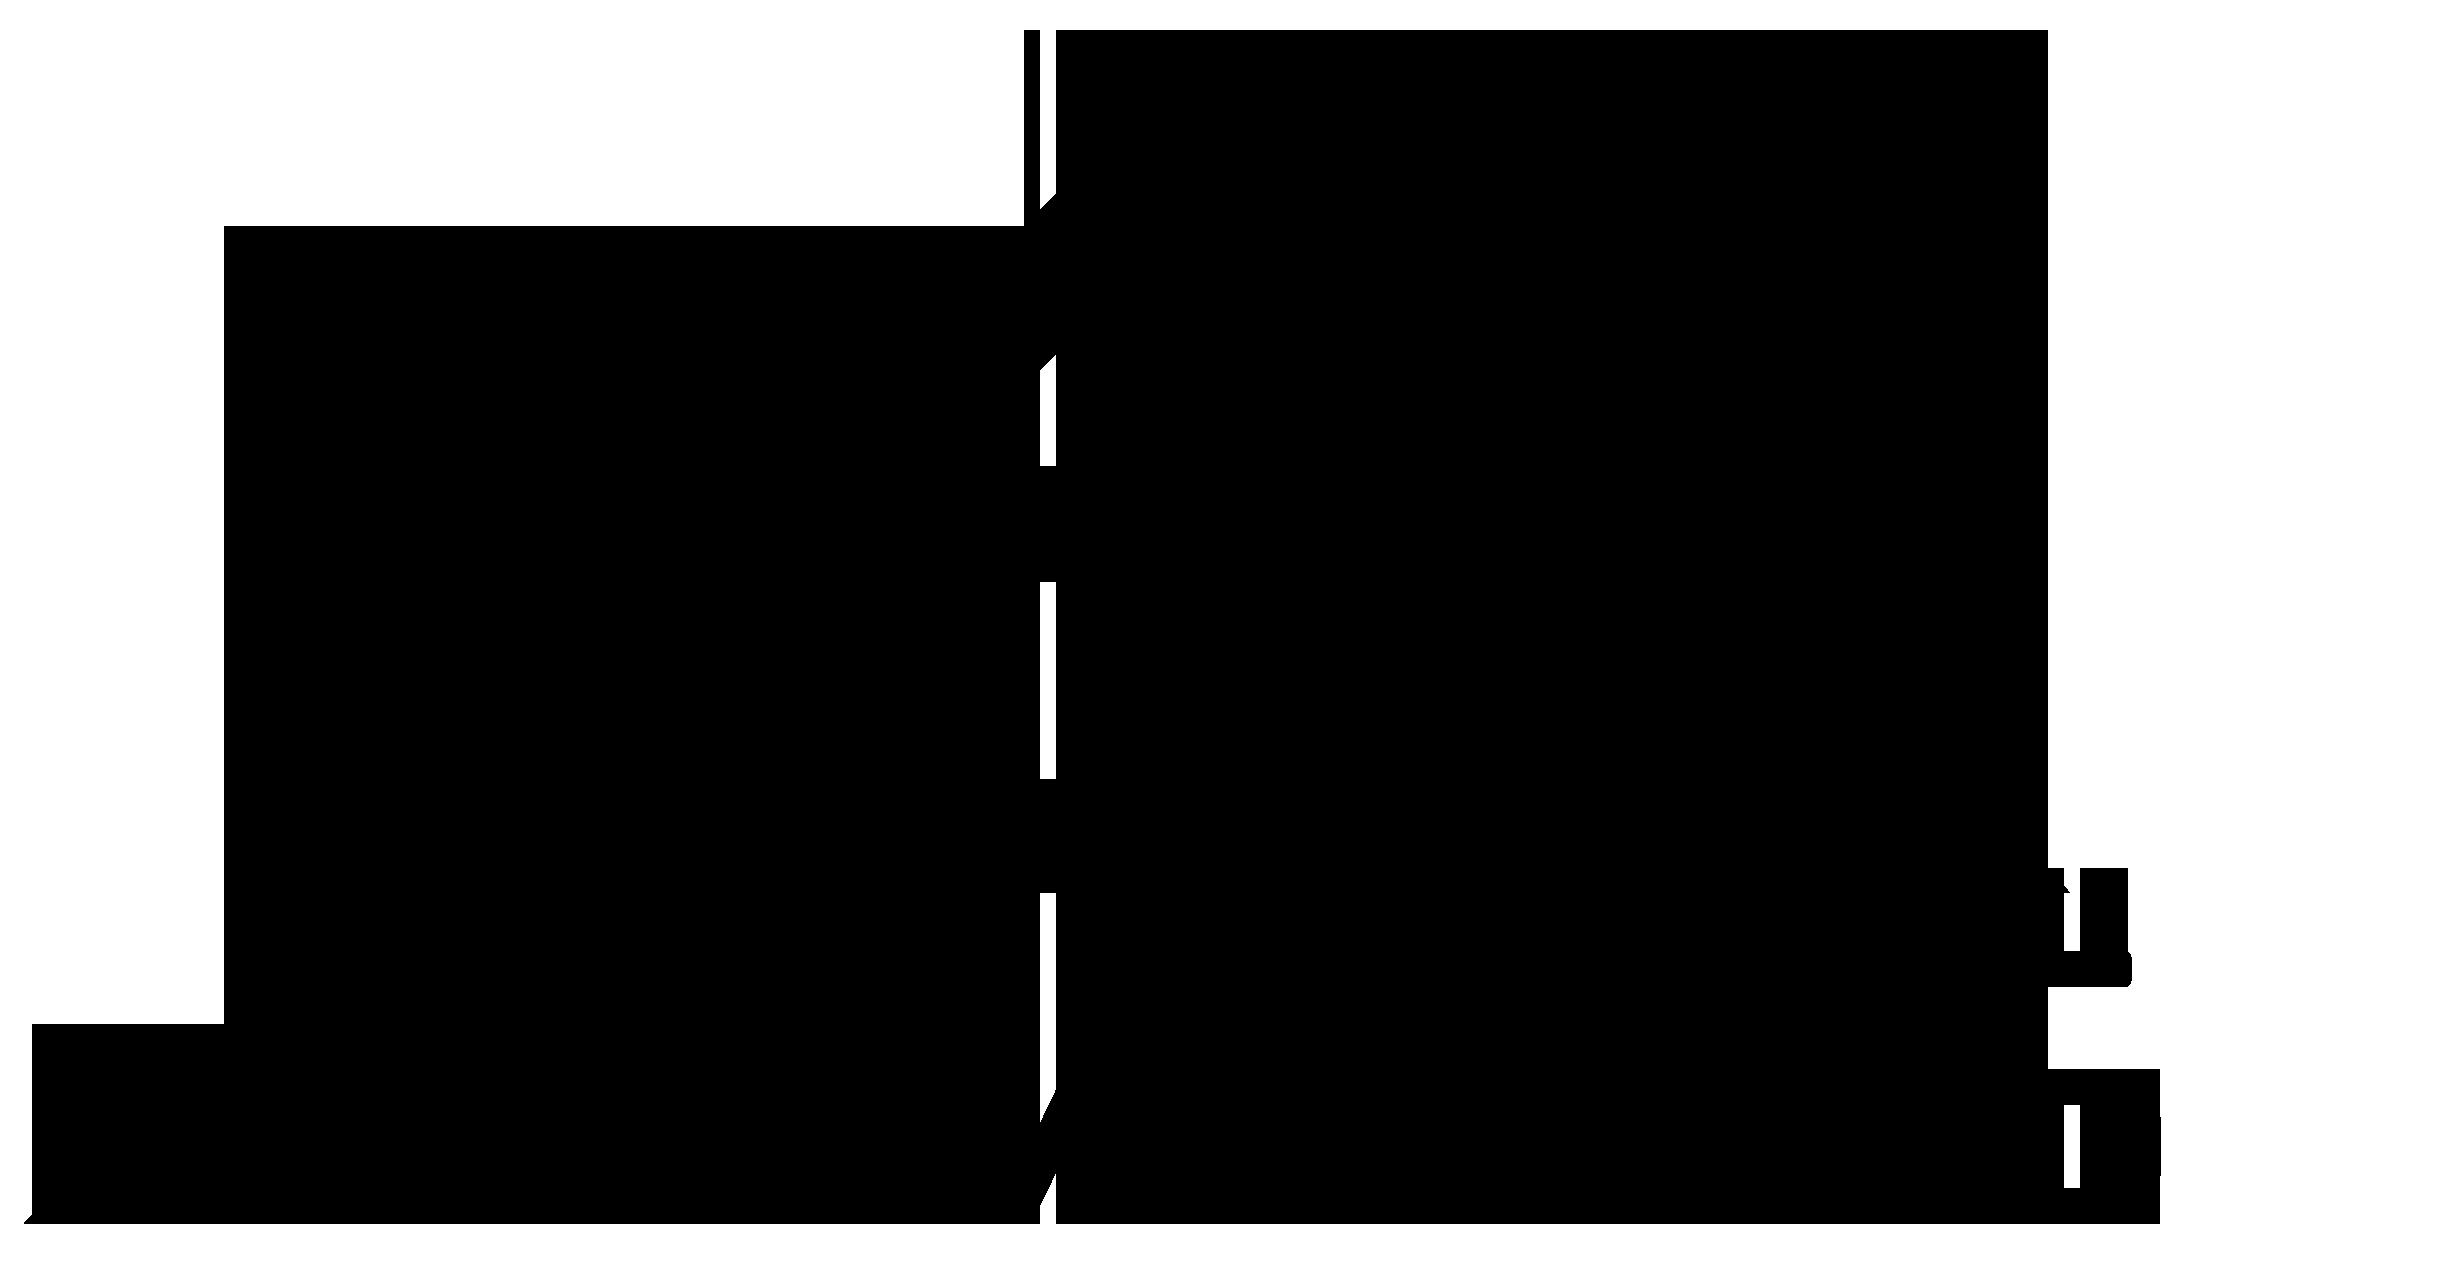 axiomdiscs-pyramid-text-logo.png